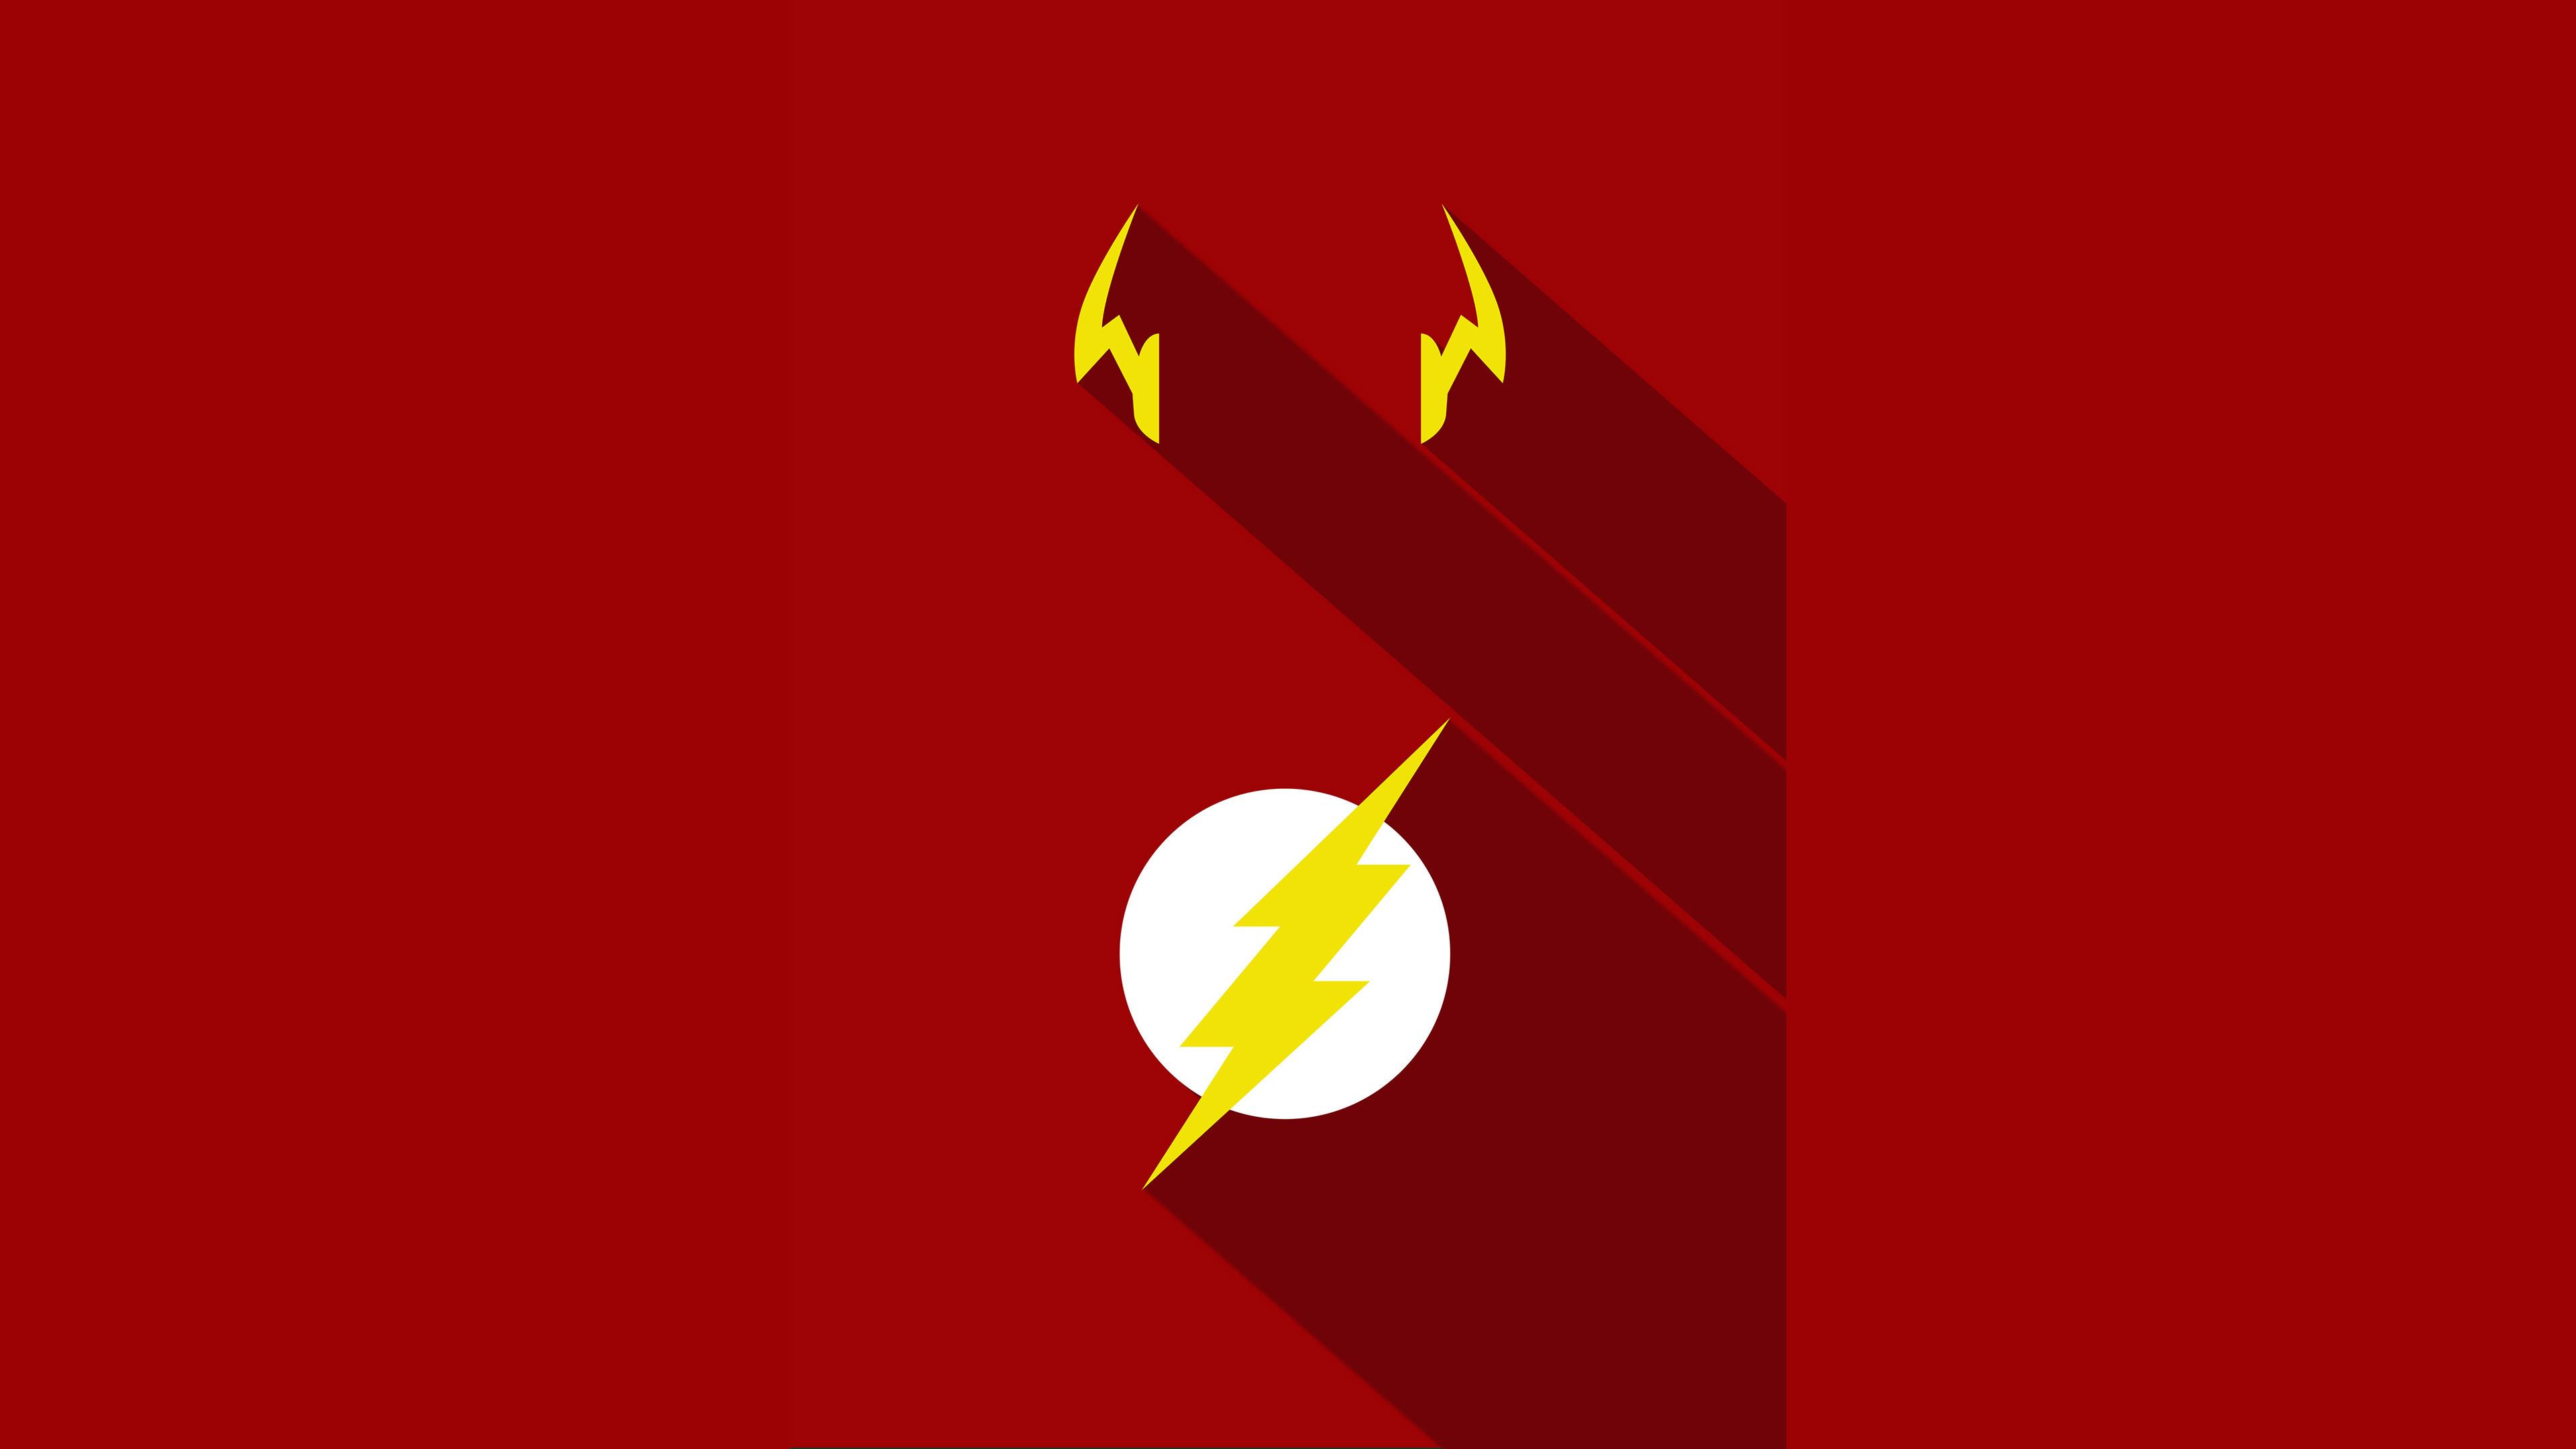 Flash Minimalism Poster | Superheroes HD 4k Wallpapers